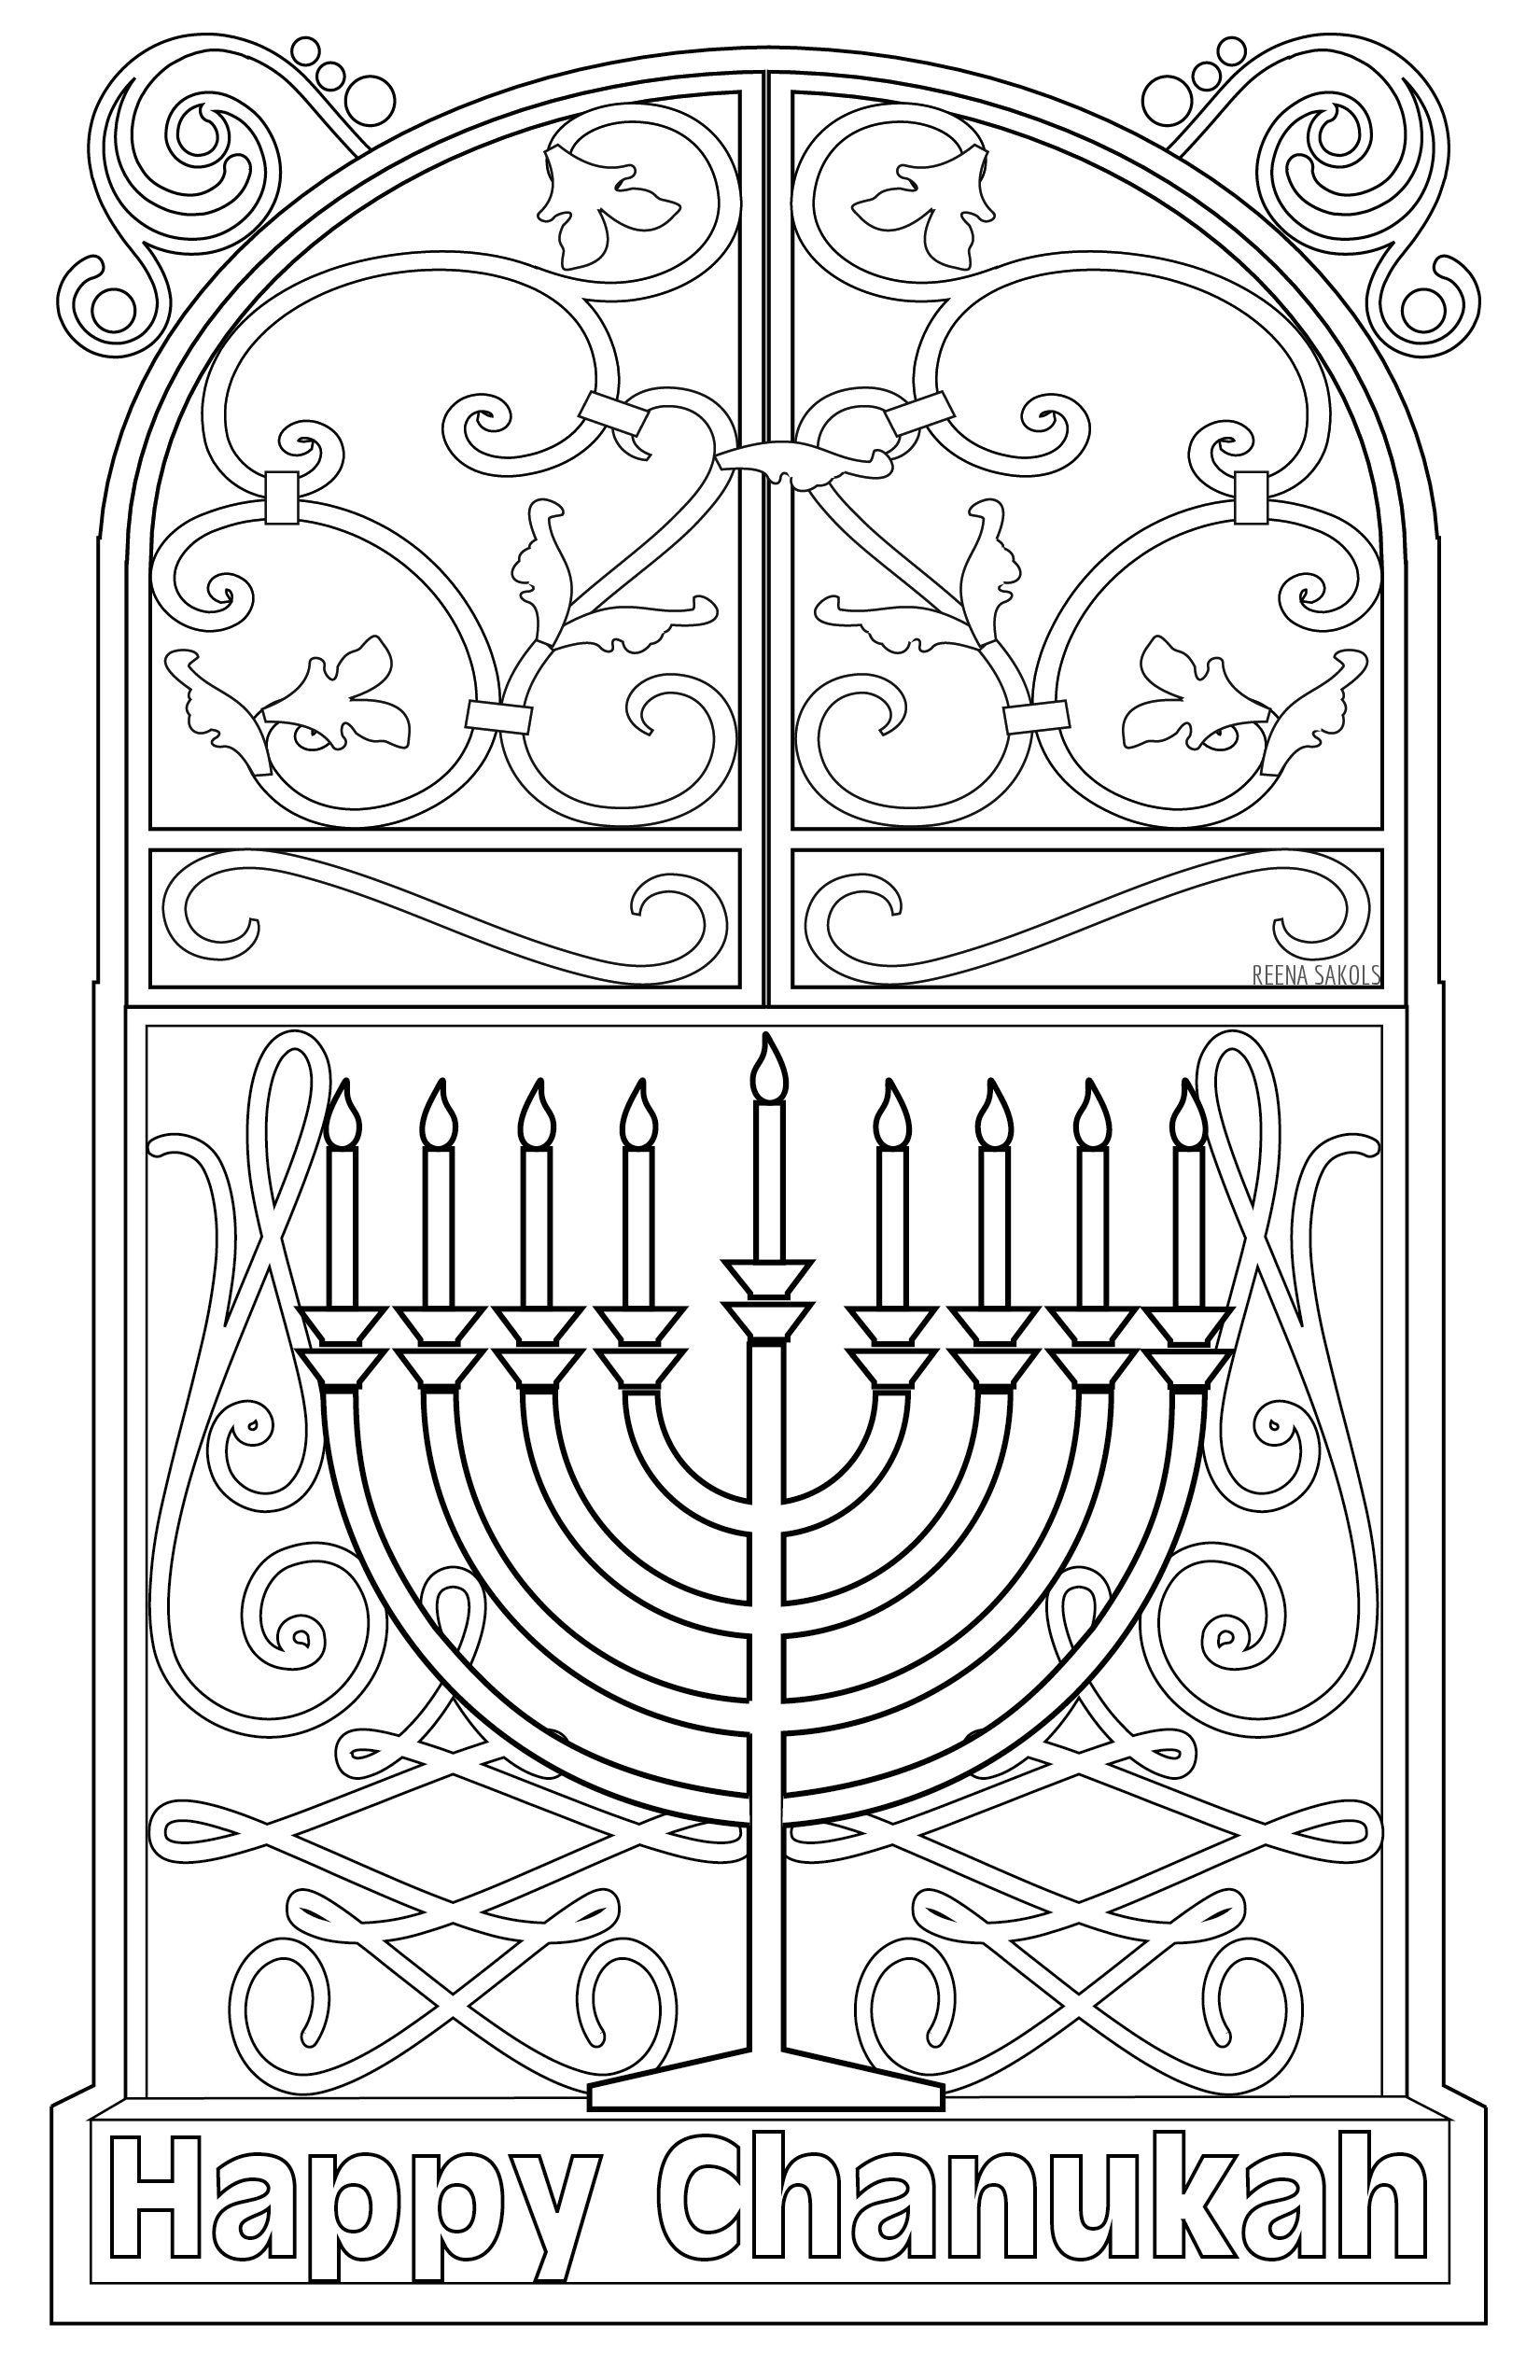 Image Result For Hanukkah Coloring Pages Hanukkah Crafts Jewish Crafts How To Celebrate Hanukkah